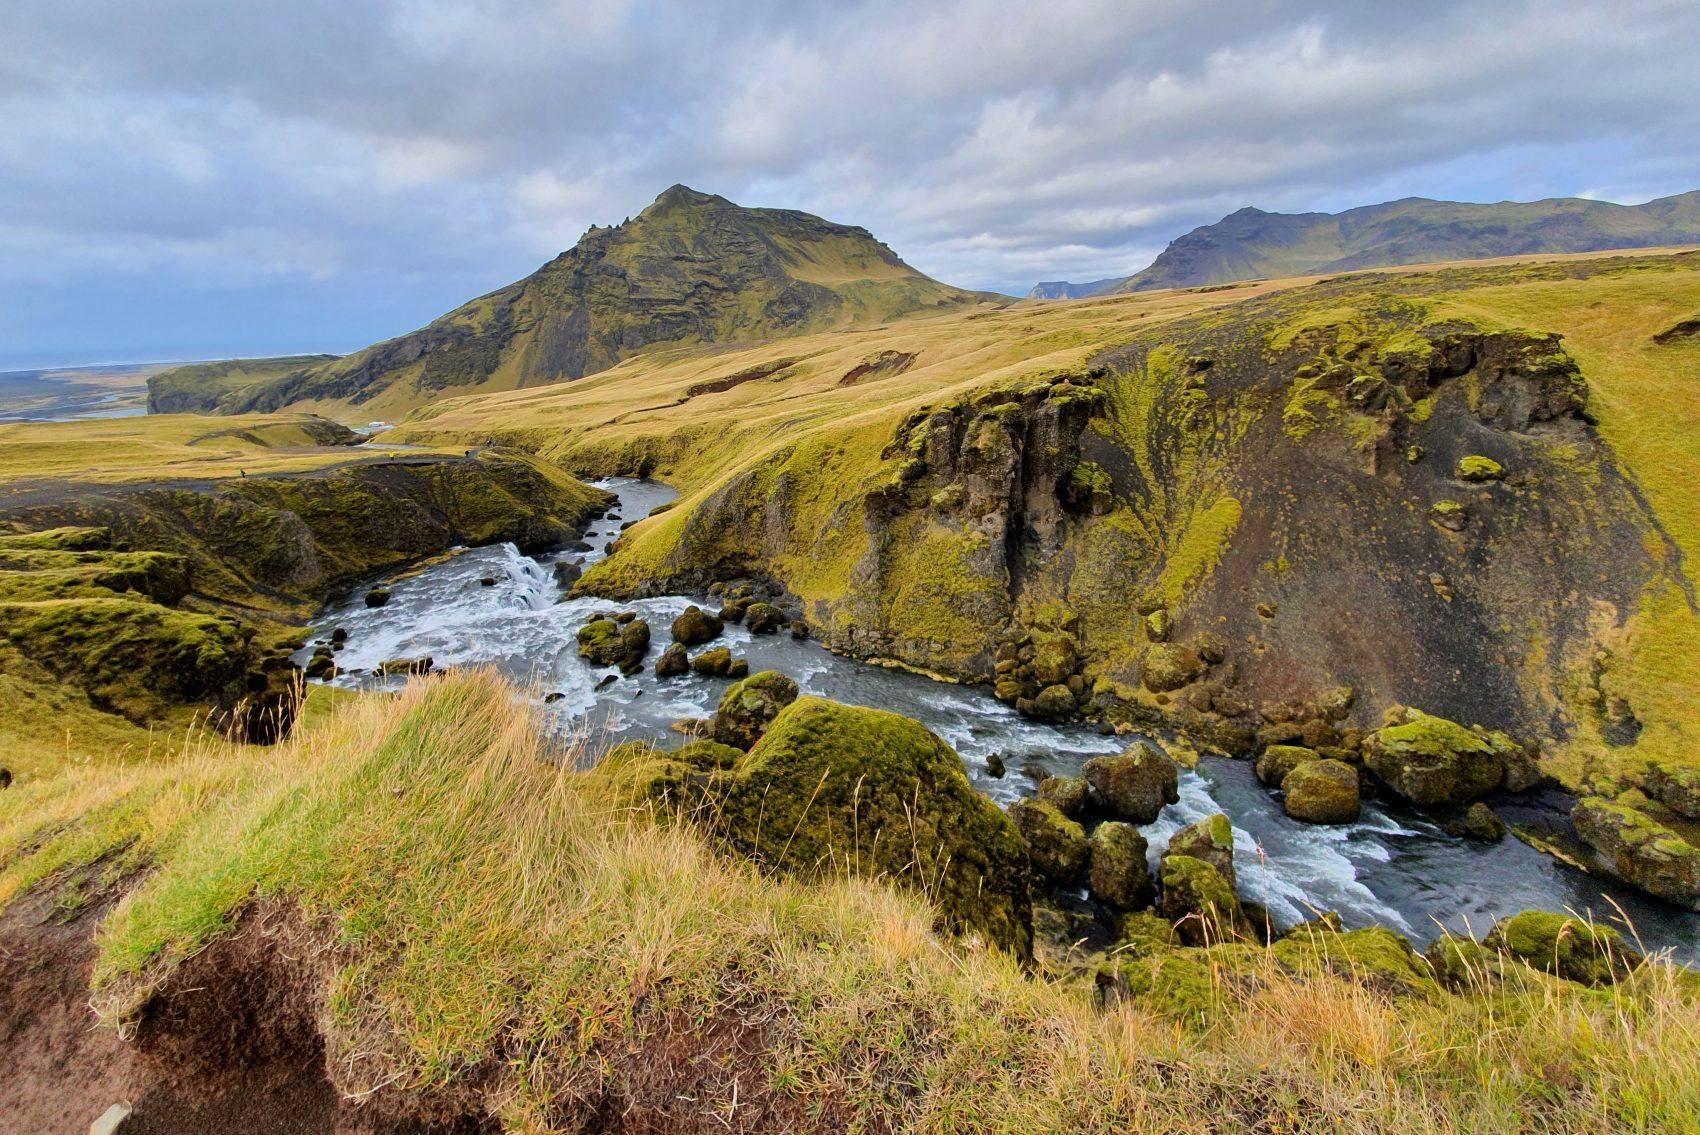 Skogafoss wandelpad Zuid-ijsland